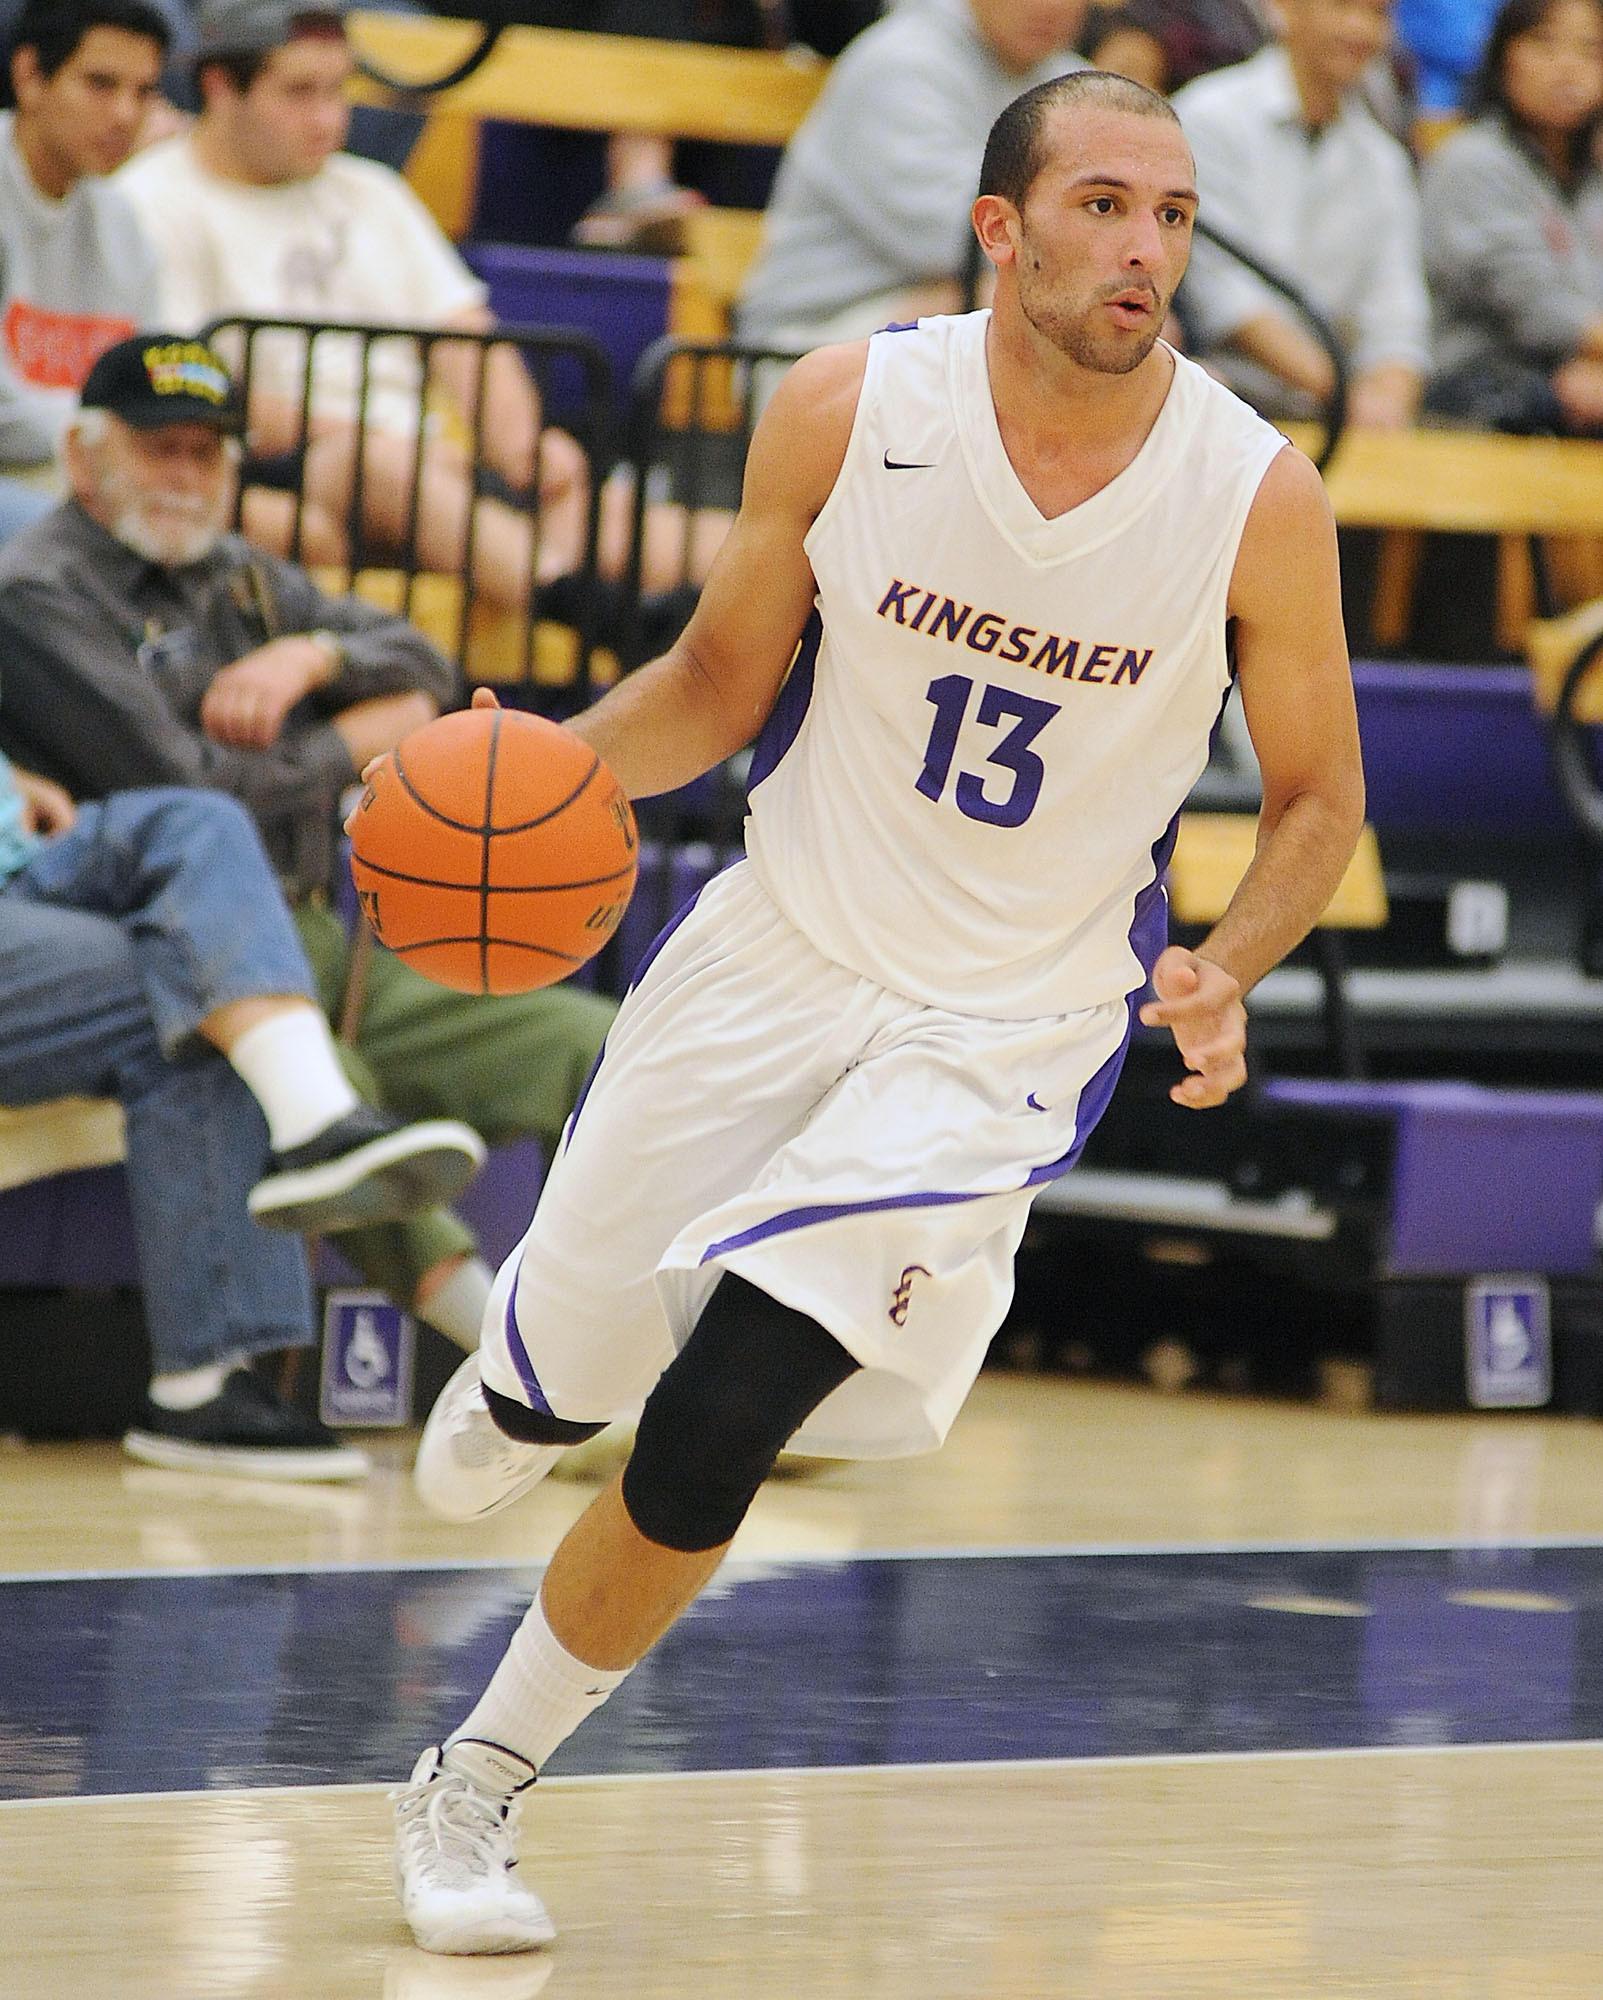 Coltrane Powdrill of California Lutheran University men's basketball team.